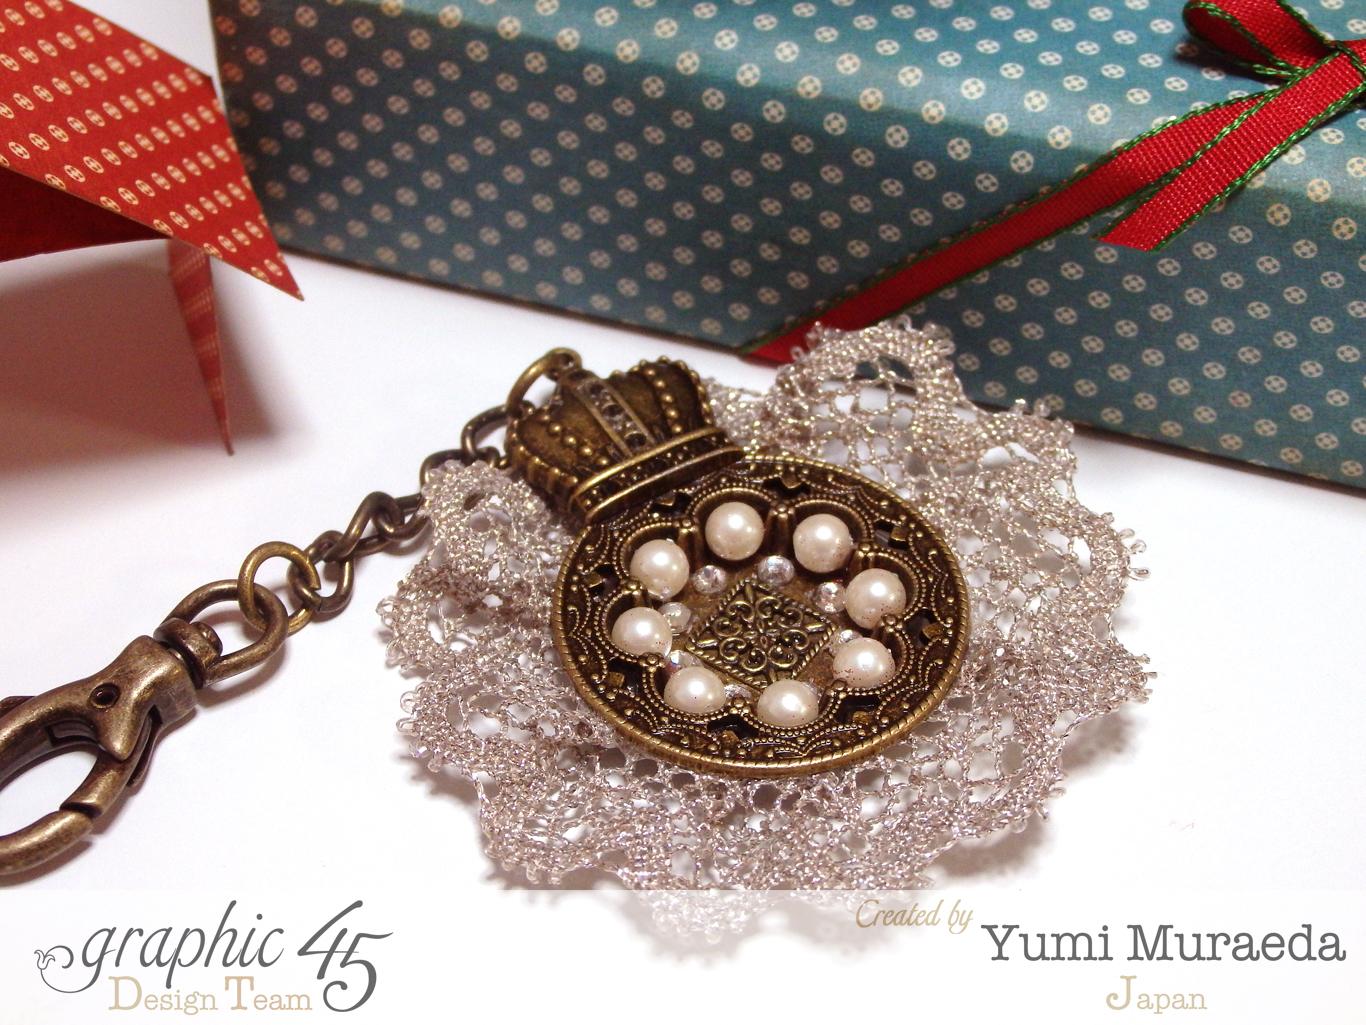 yuyu3christmaskeyholderhouse5.jpg